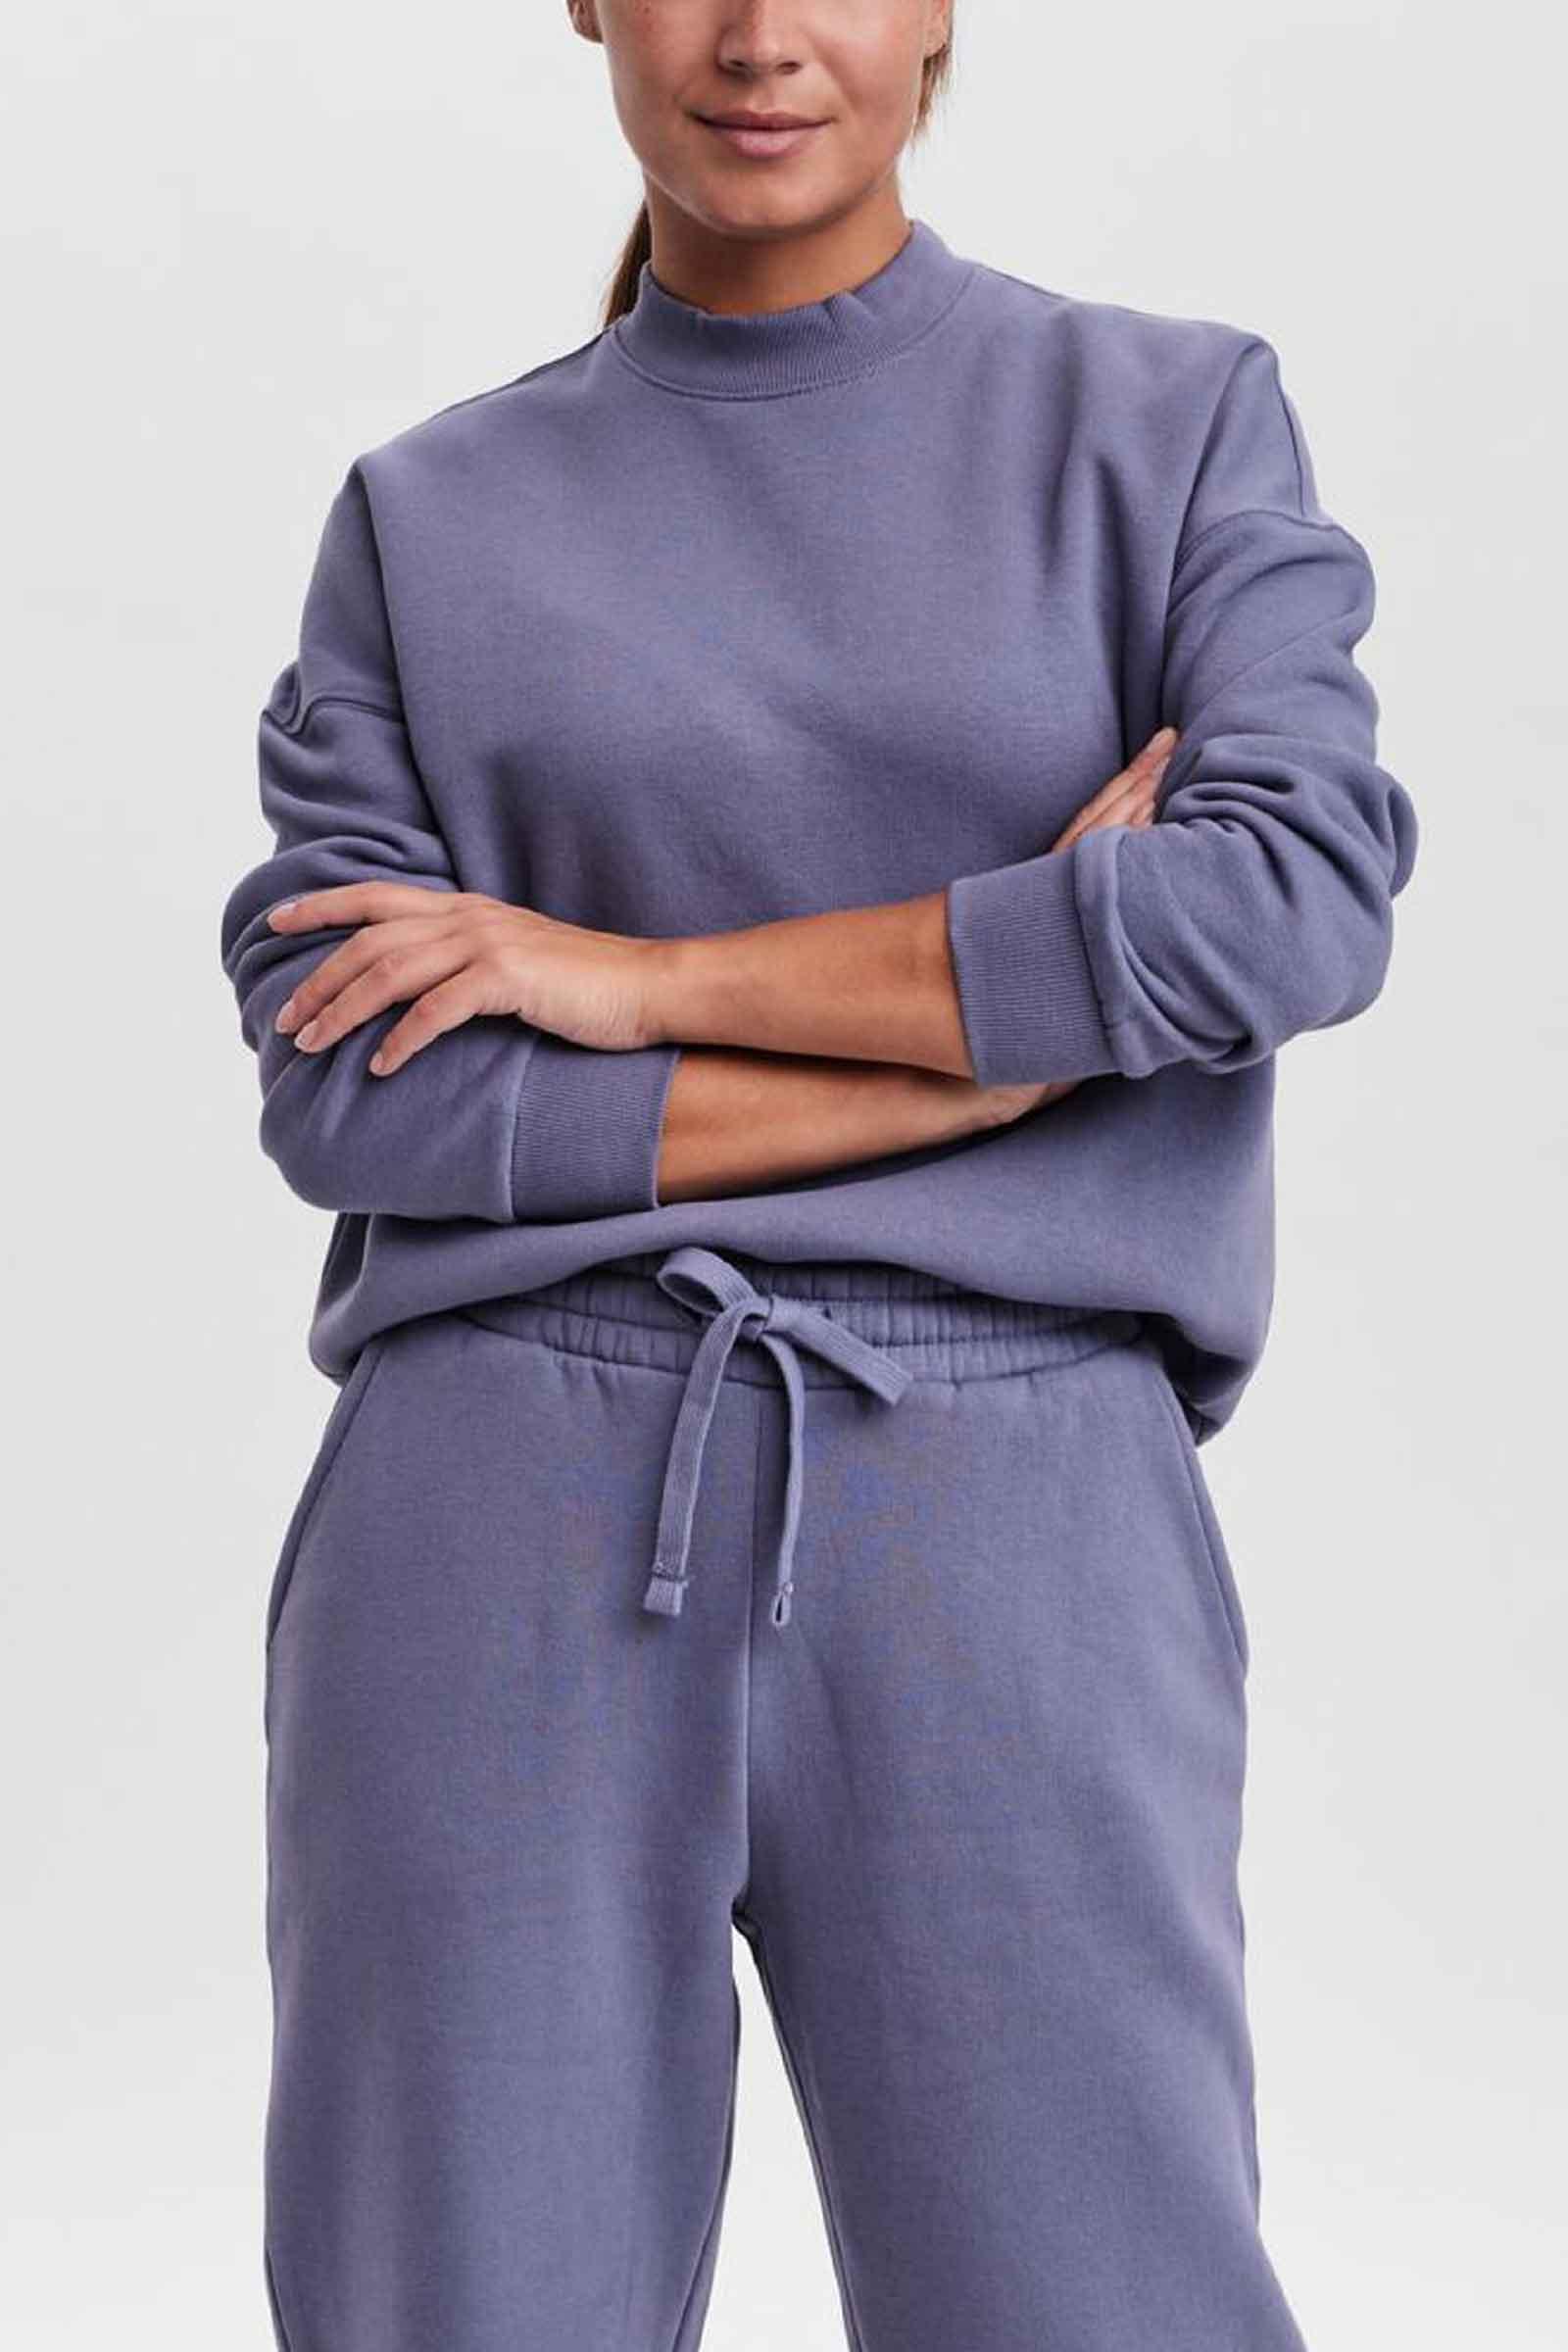 Women's Sweatshirt VERO MODA   Sweatshirt   10220486Flint Stone